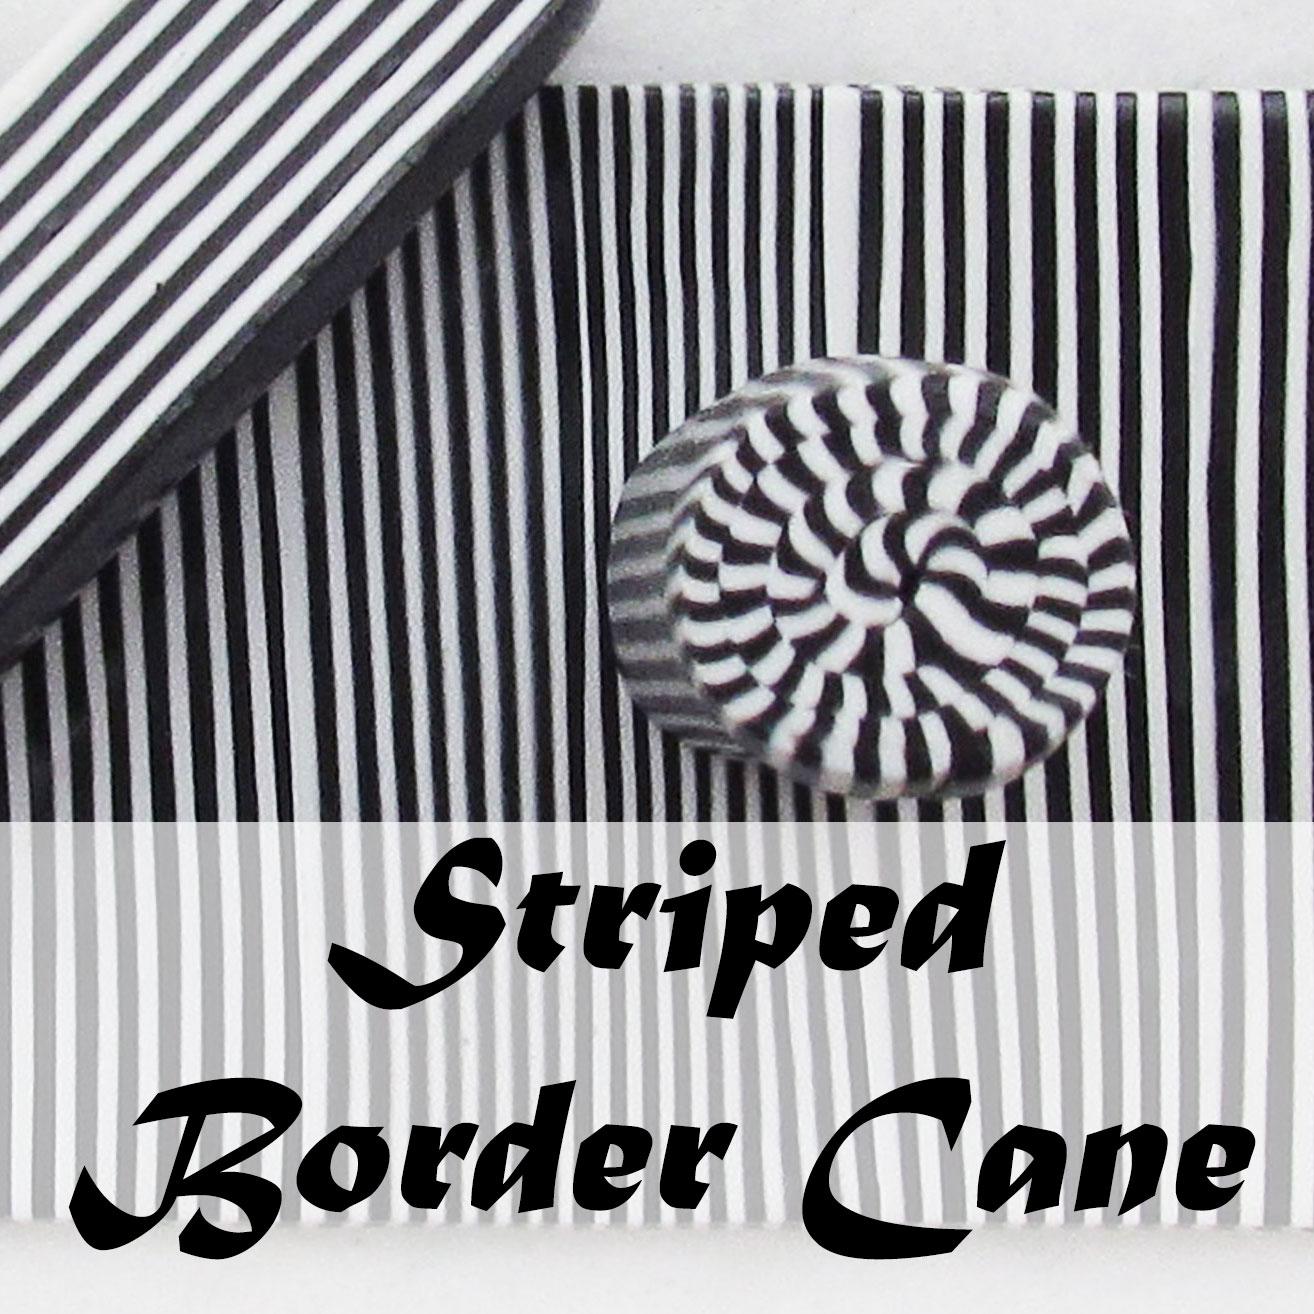 Striped Polymer Clay Border Cane